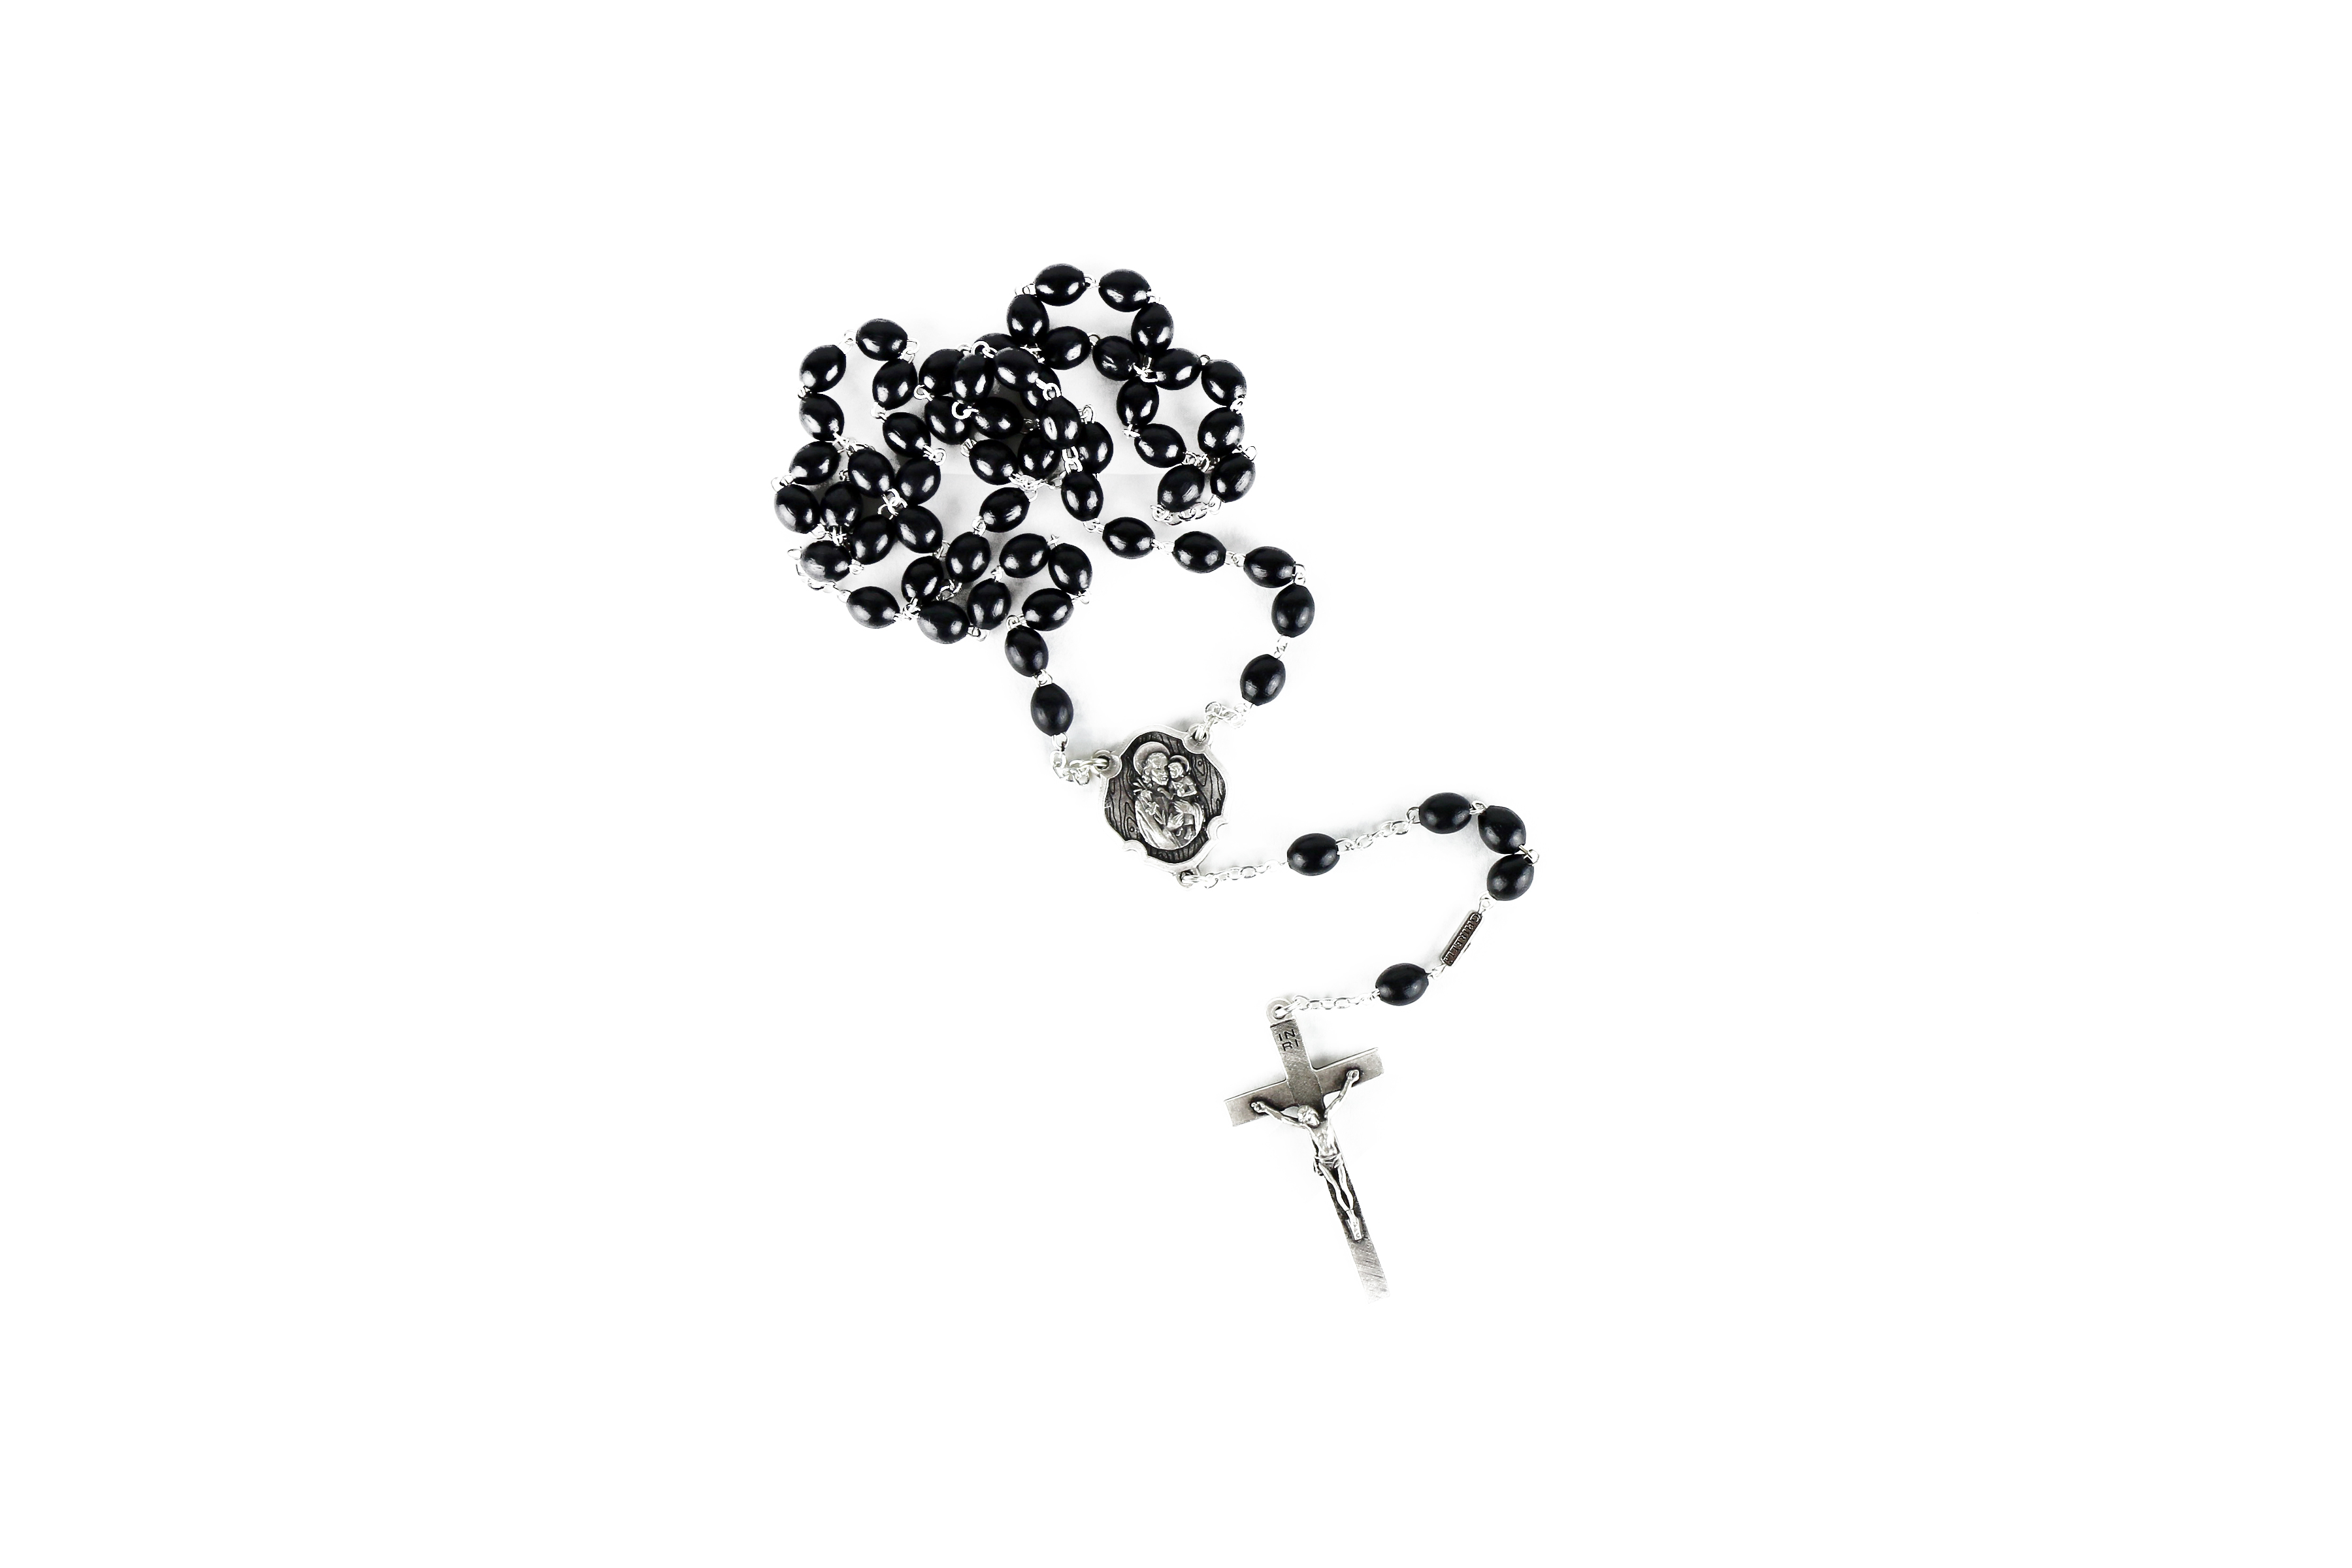 Chapelet de saint Joseph / Saint Joseph Rosary